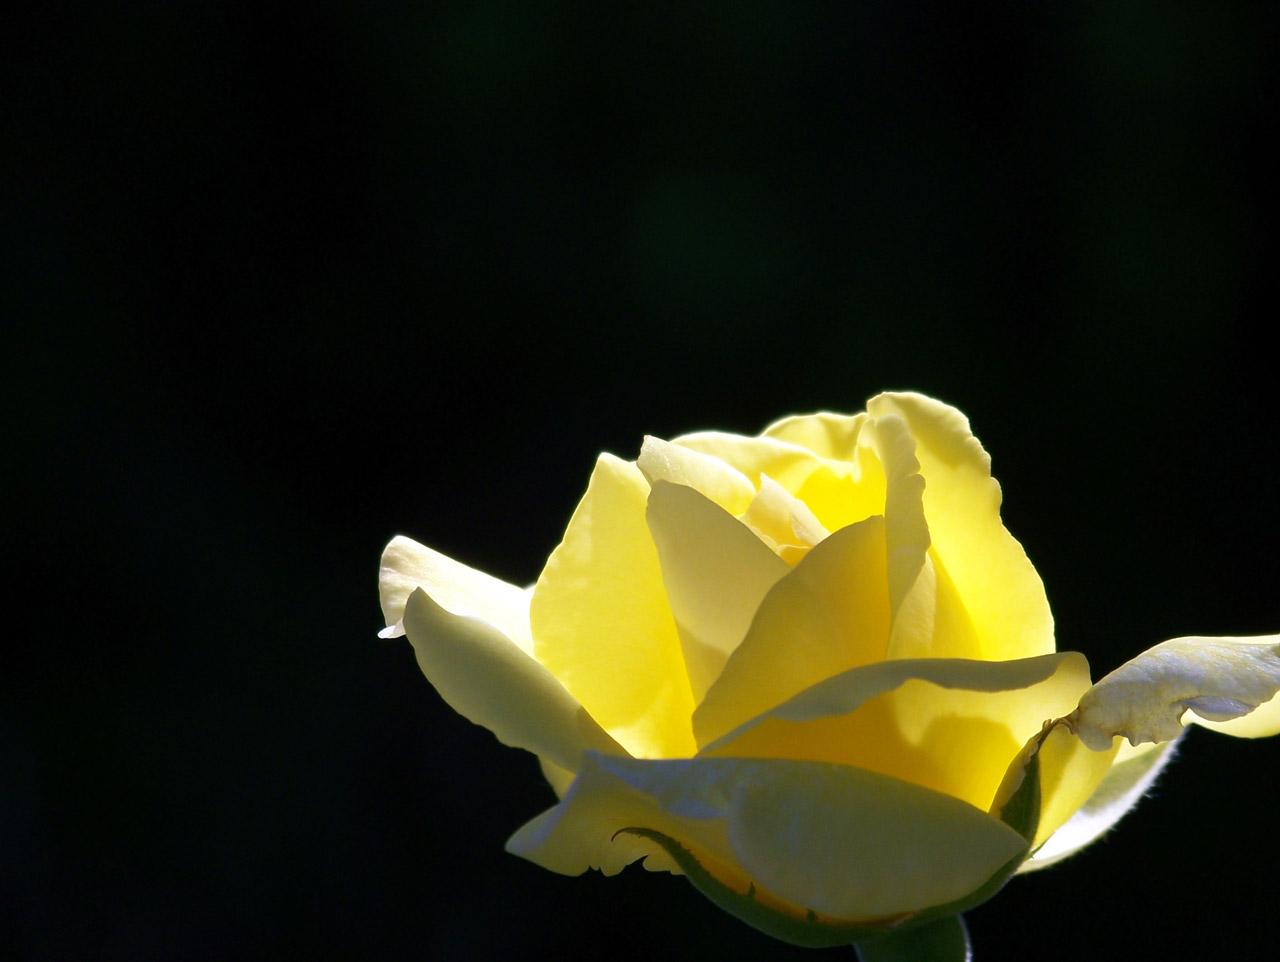 yellow love rose - HD1280×962